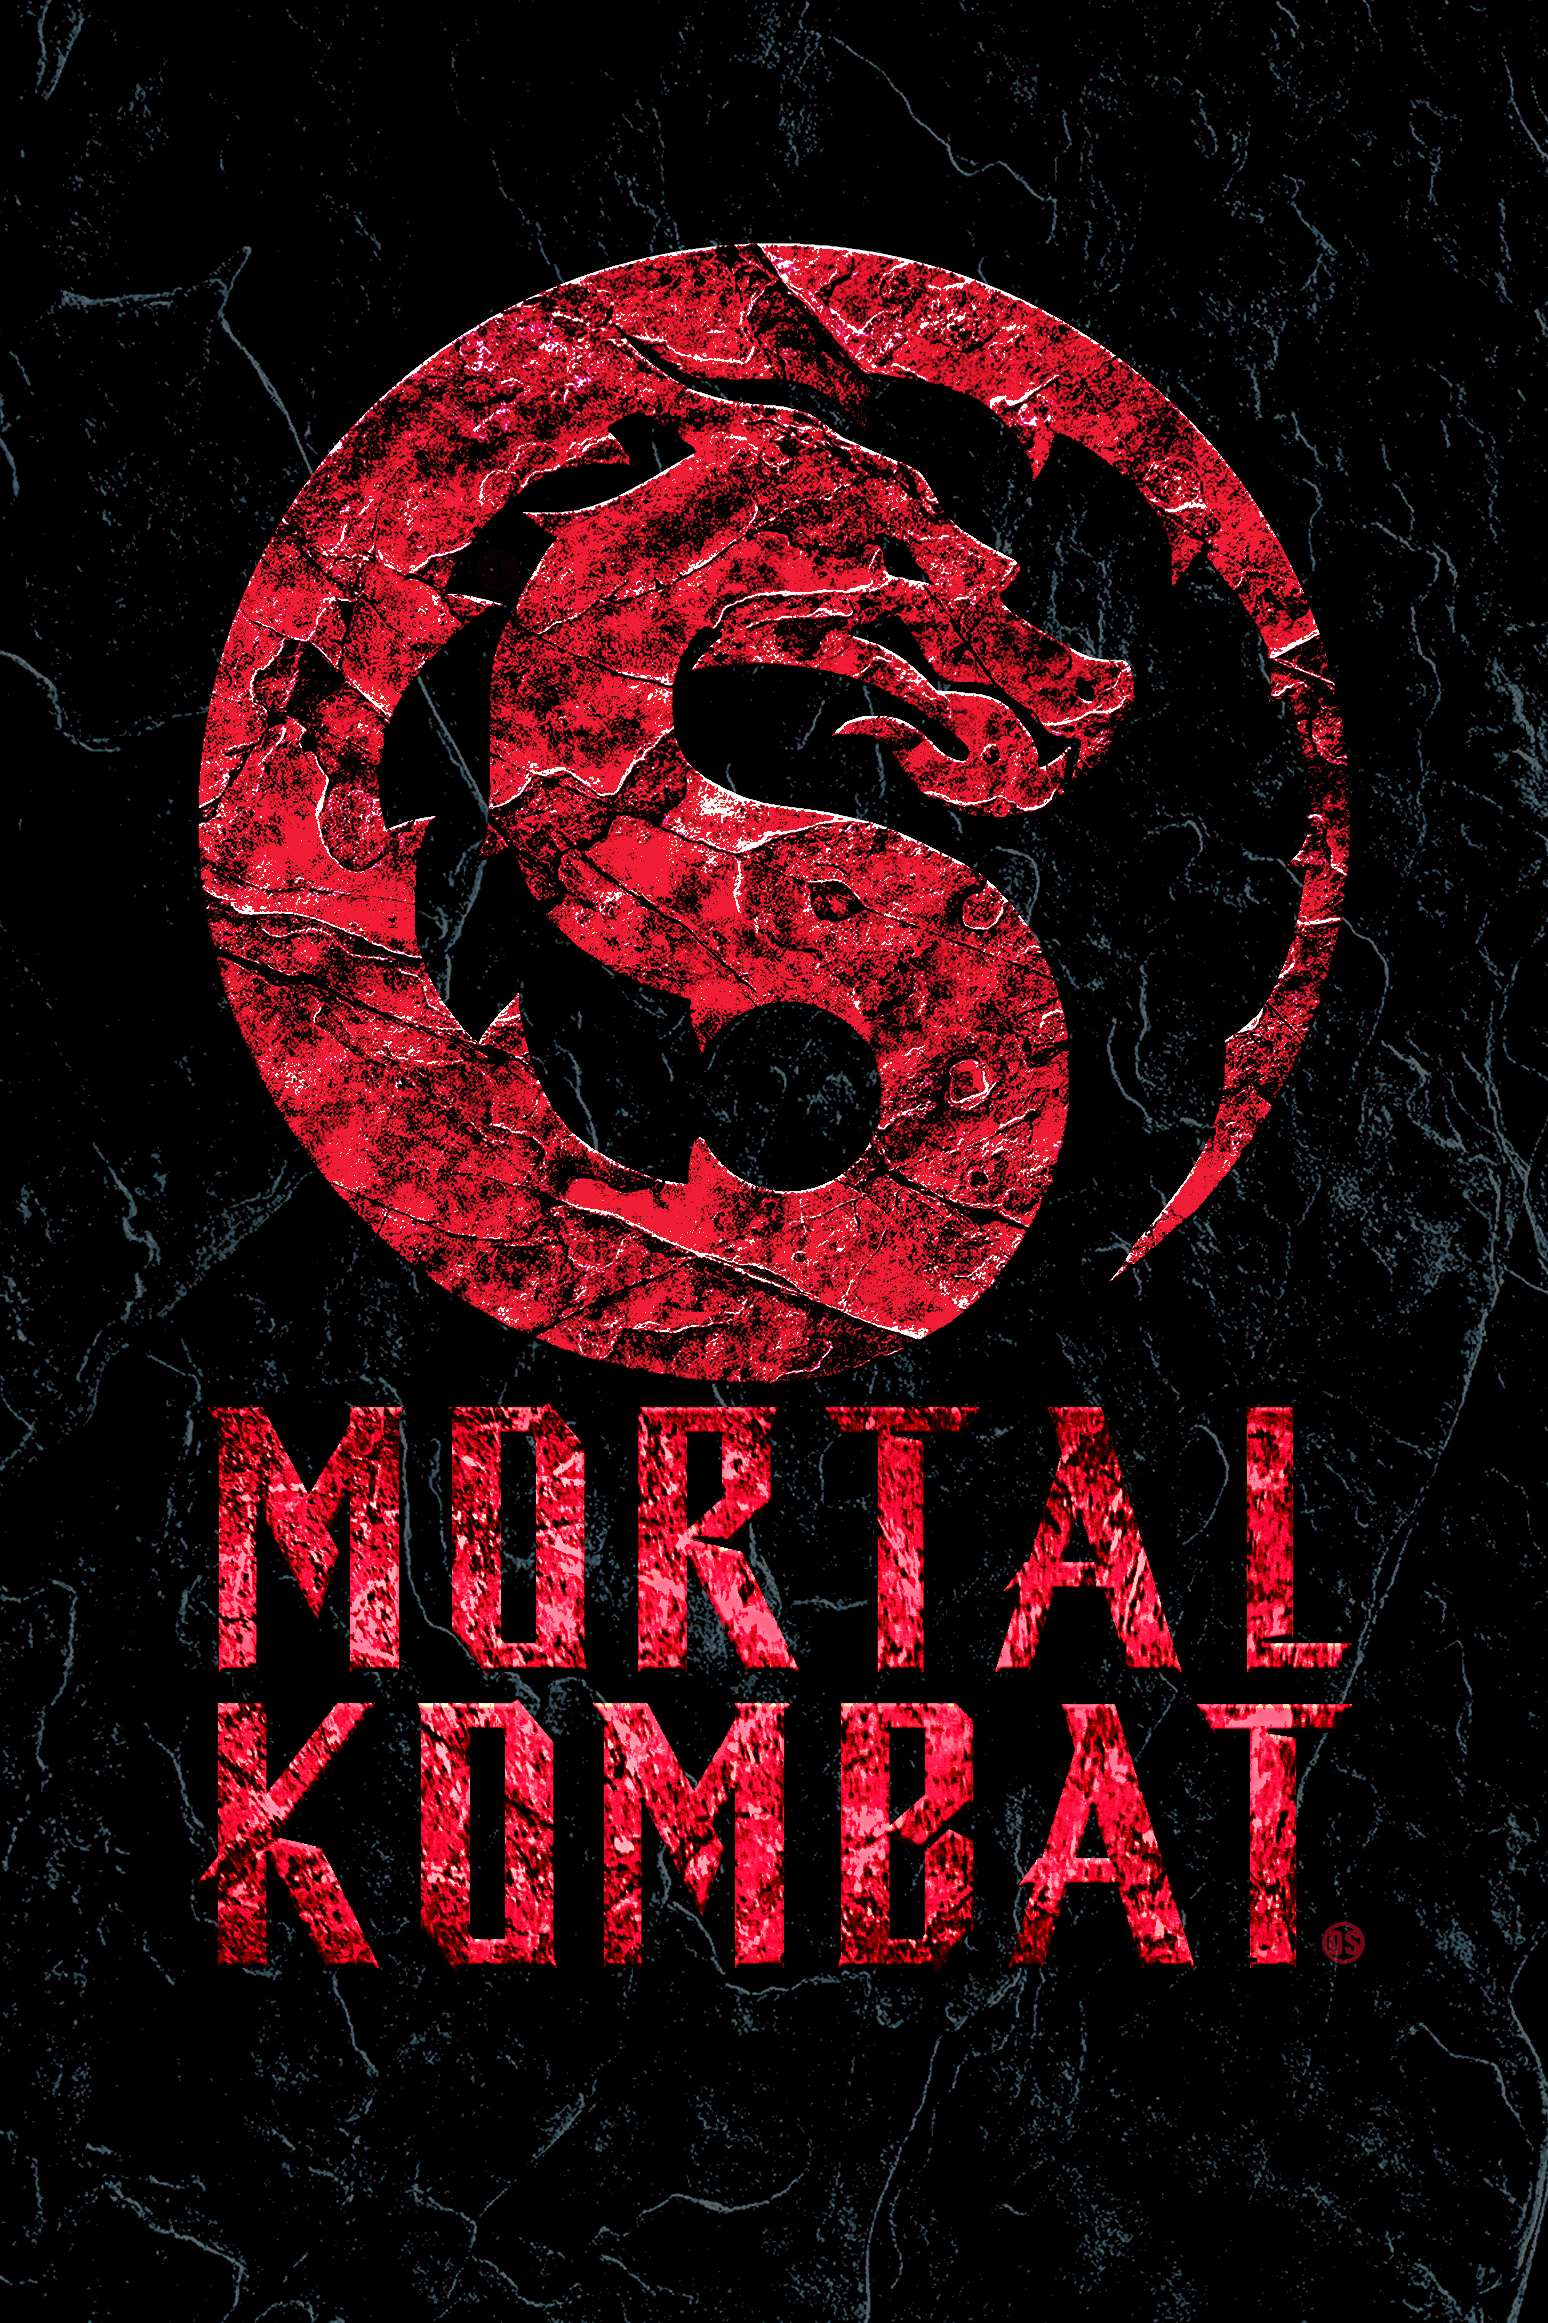 Watch Mortal Kombat Online 123movies Full Hd Mortal Kombat Logo Illustration Design Full Movies Online Free